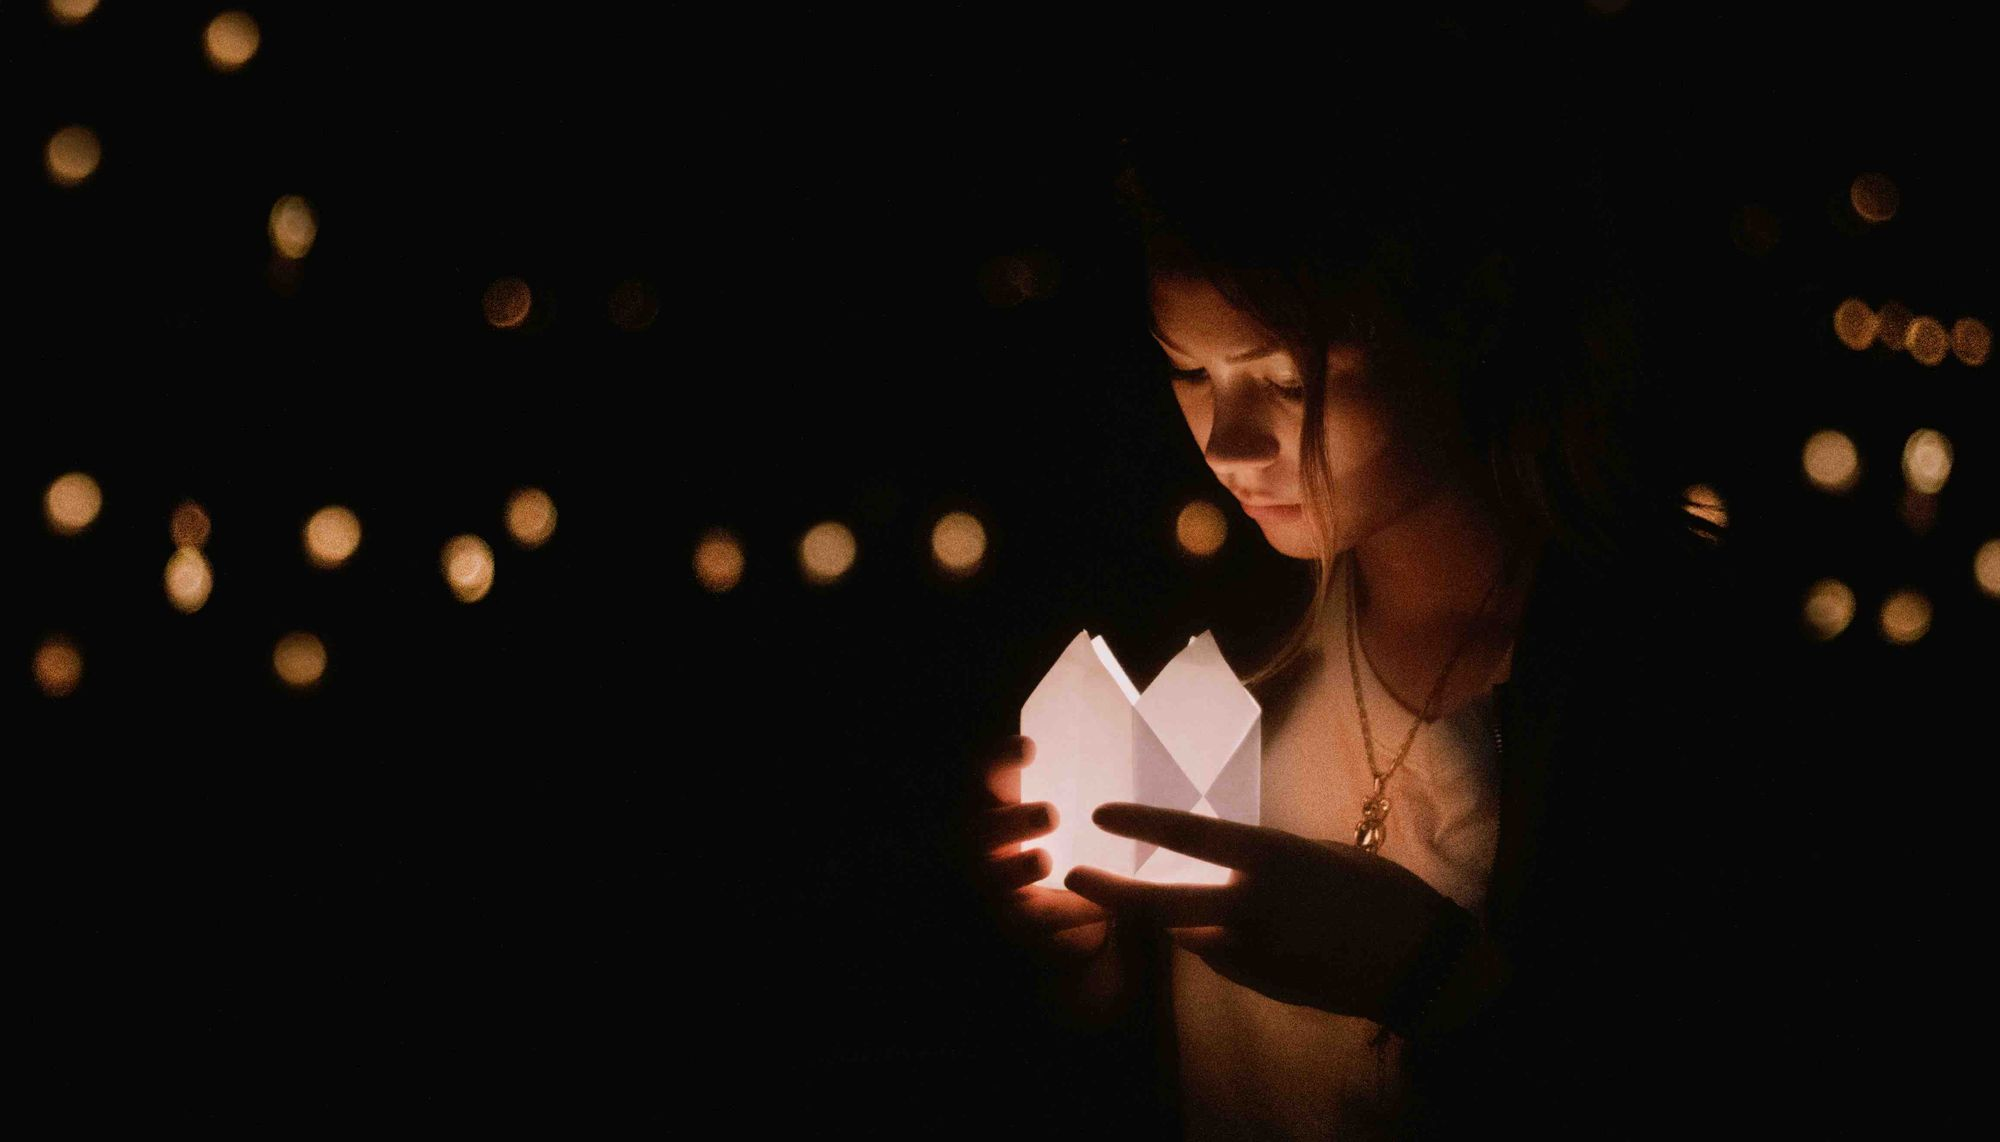 Matikan Lampu, Demi Dunia yang Lebih Baik